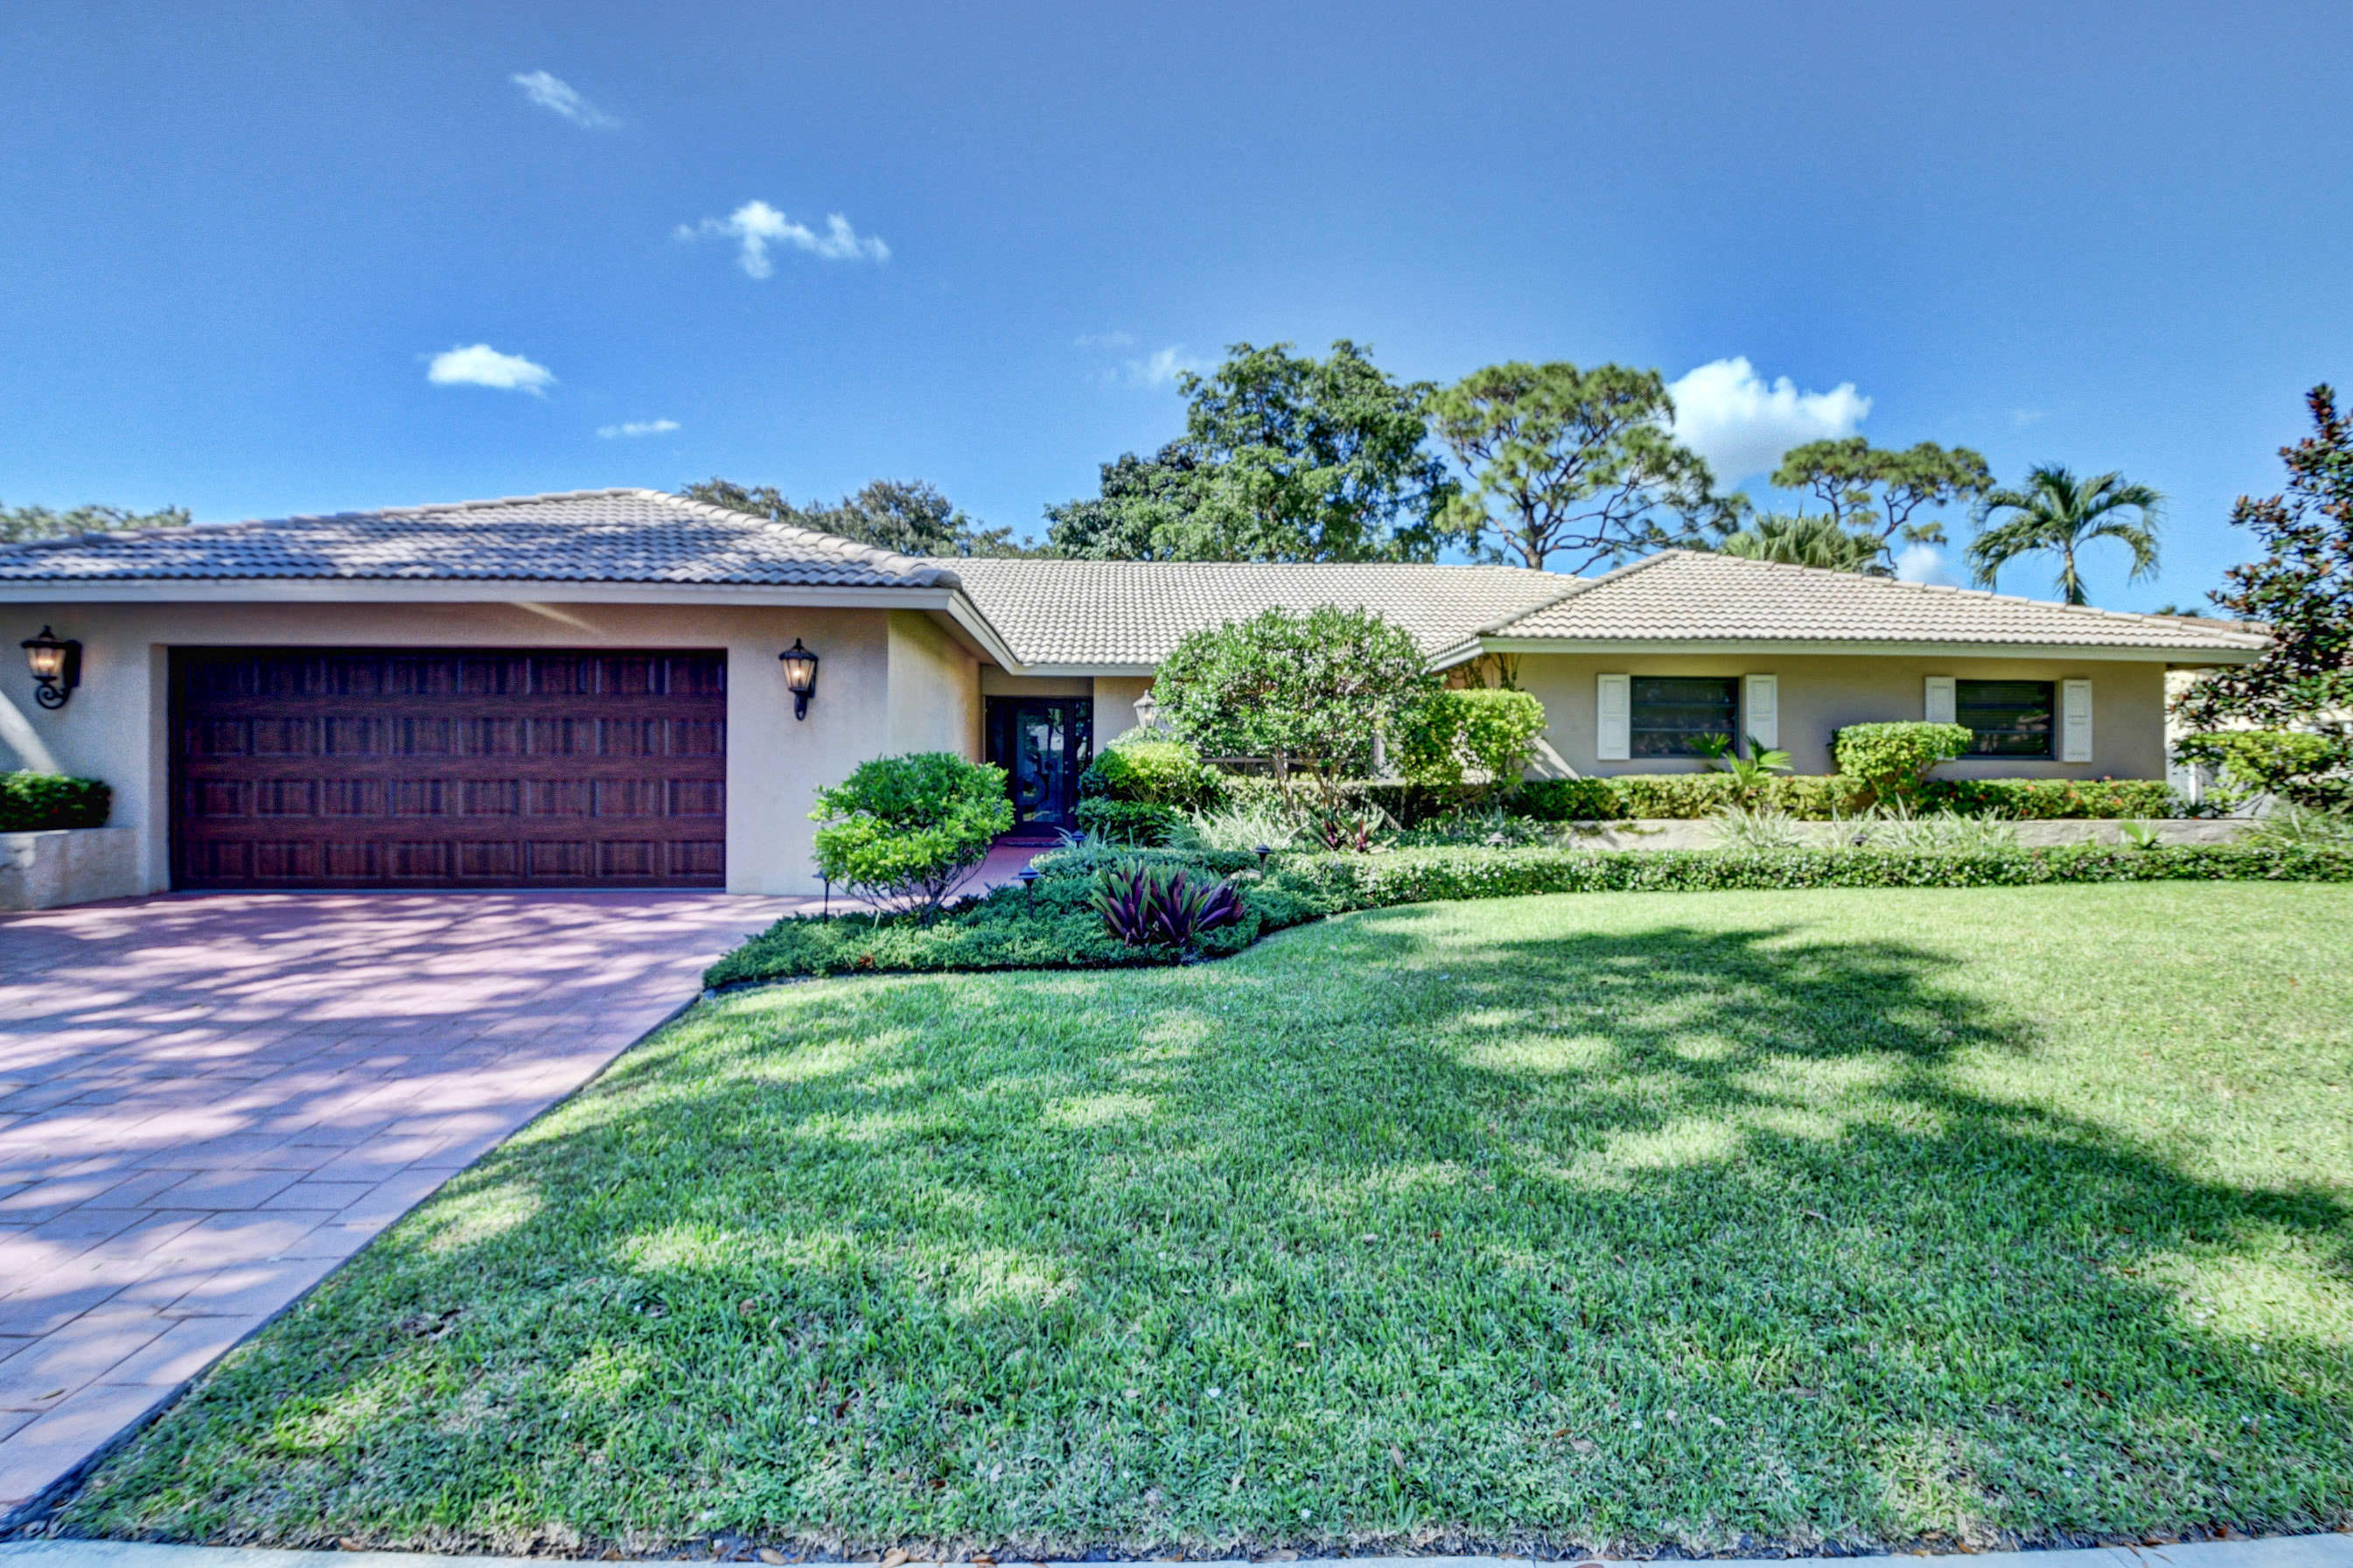 Photo of 6781 Entrada Place, Boca Raton, FL 33433